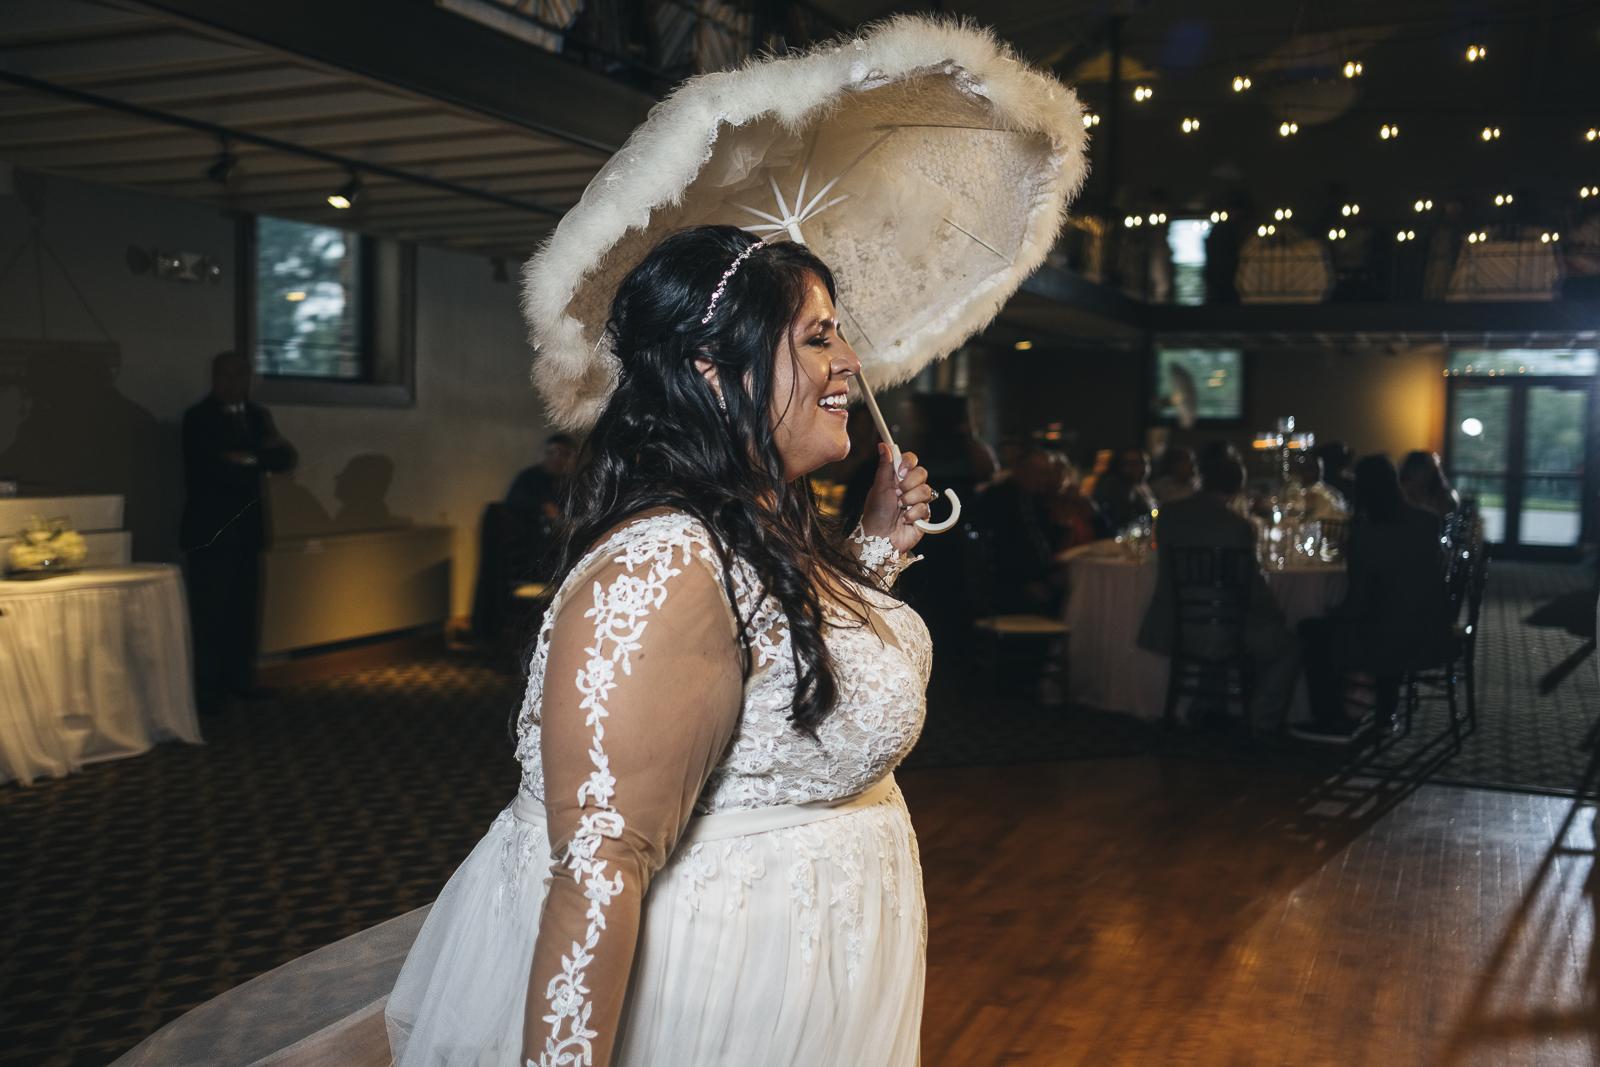 Bride participates in Second Line at her wedding reception.